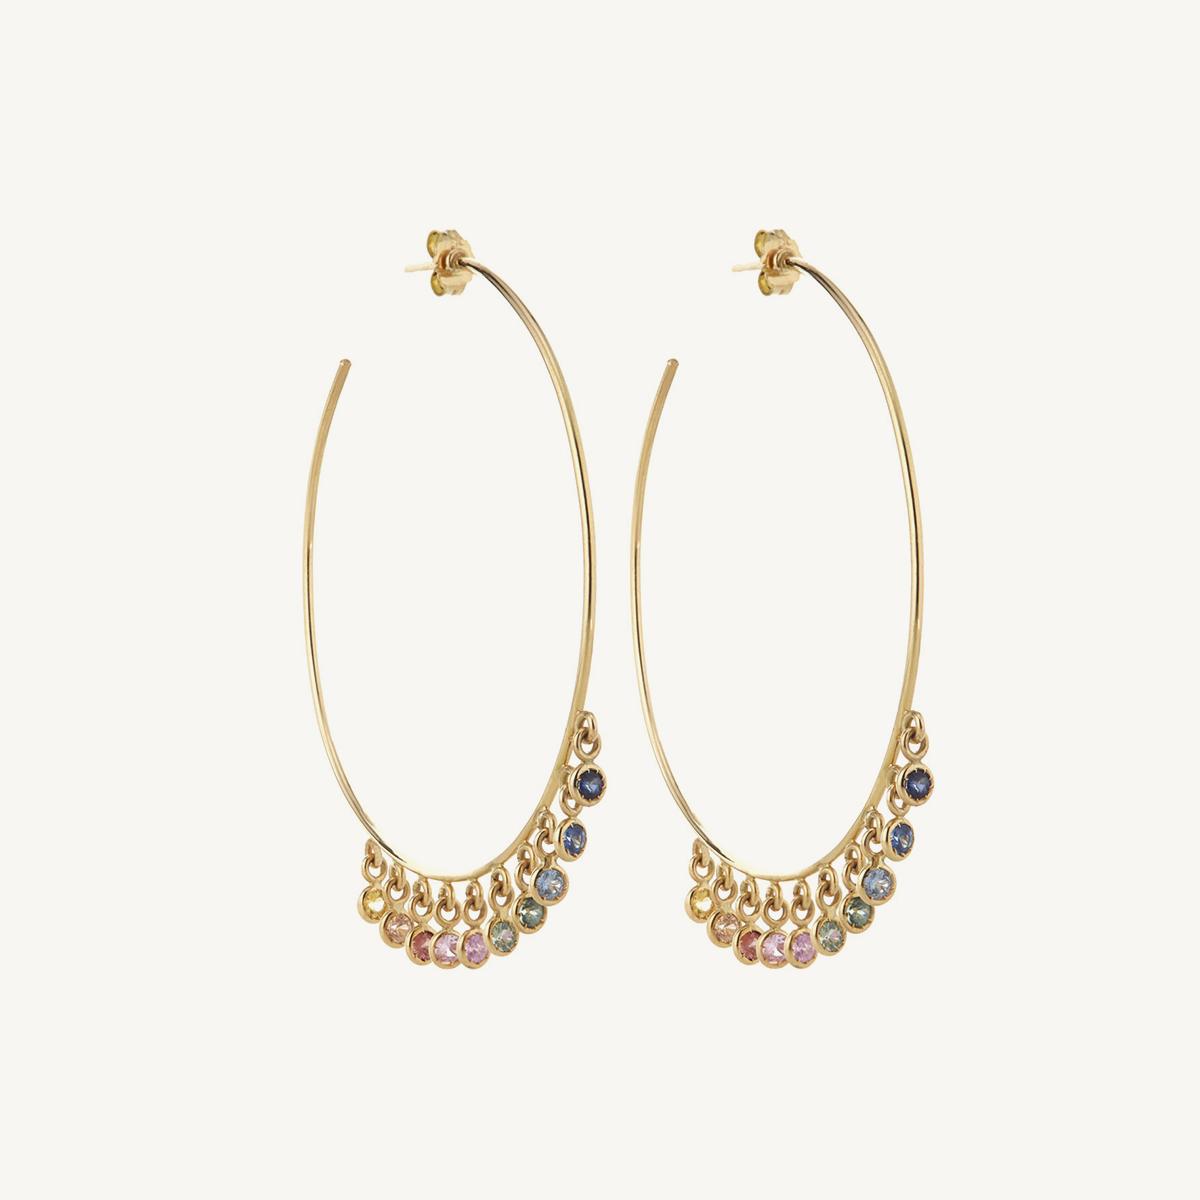 Earrings Hoola Hoops in yellow gold (BM)